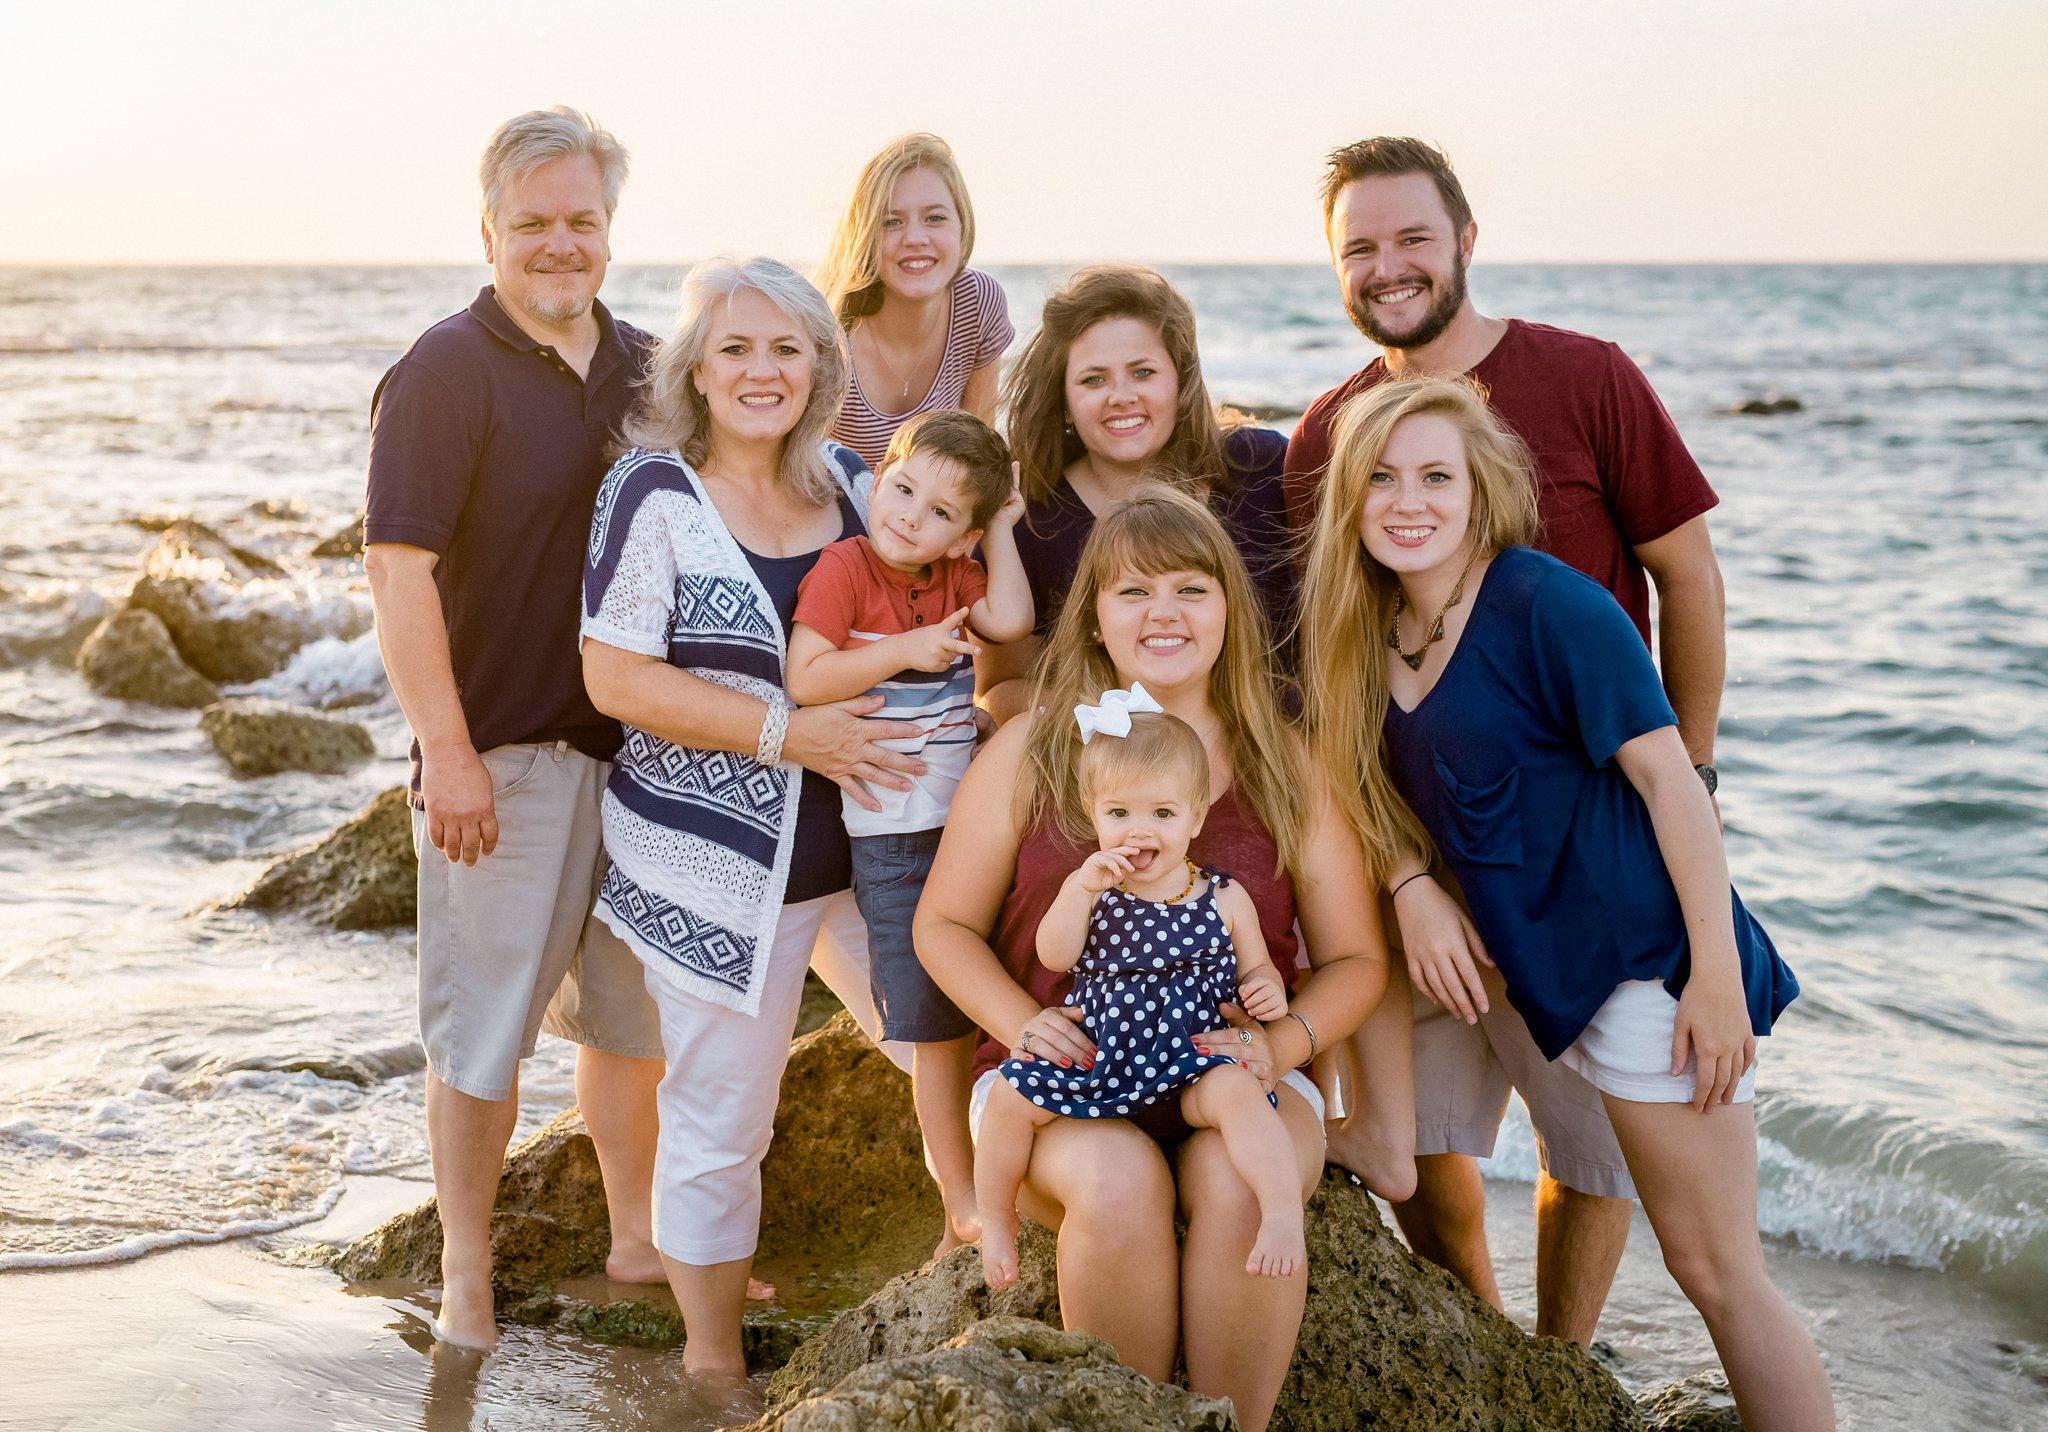 Caesarea-israel-beach-family-session-kate-giryes-photography-29_WEB.jpg